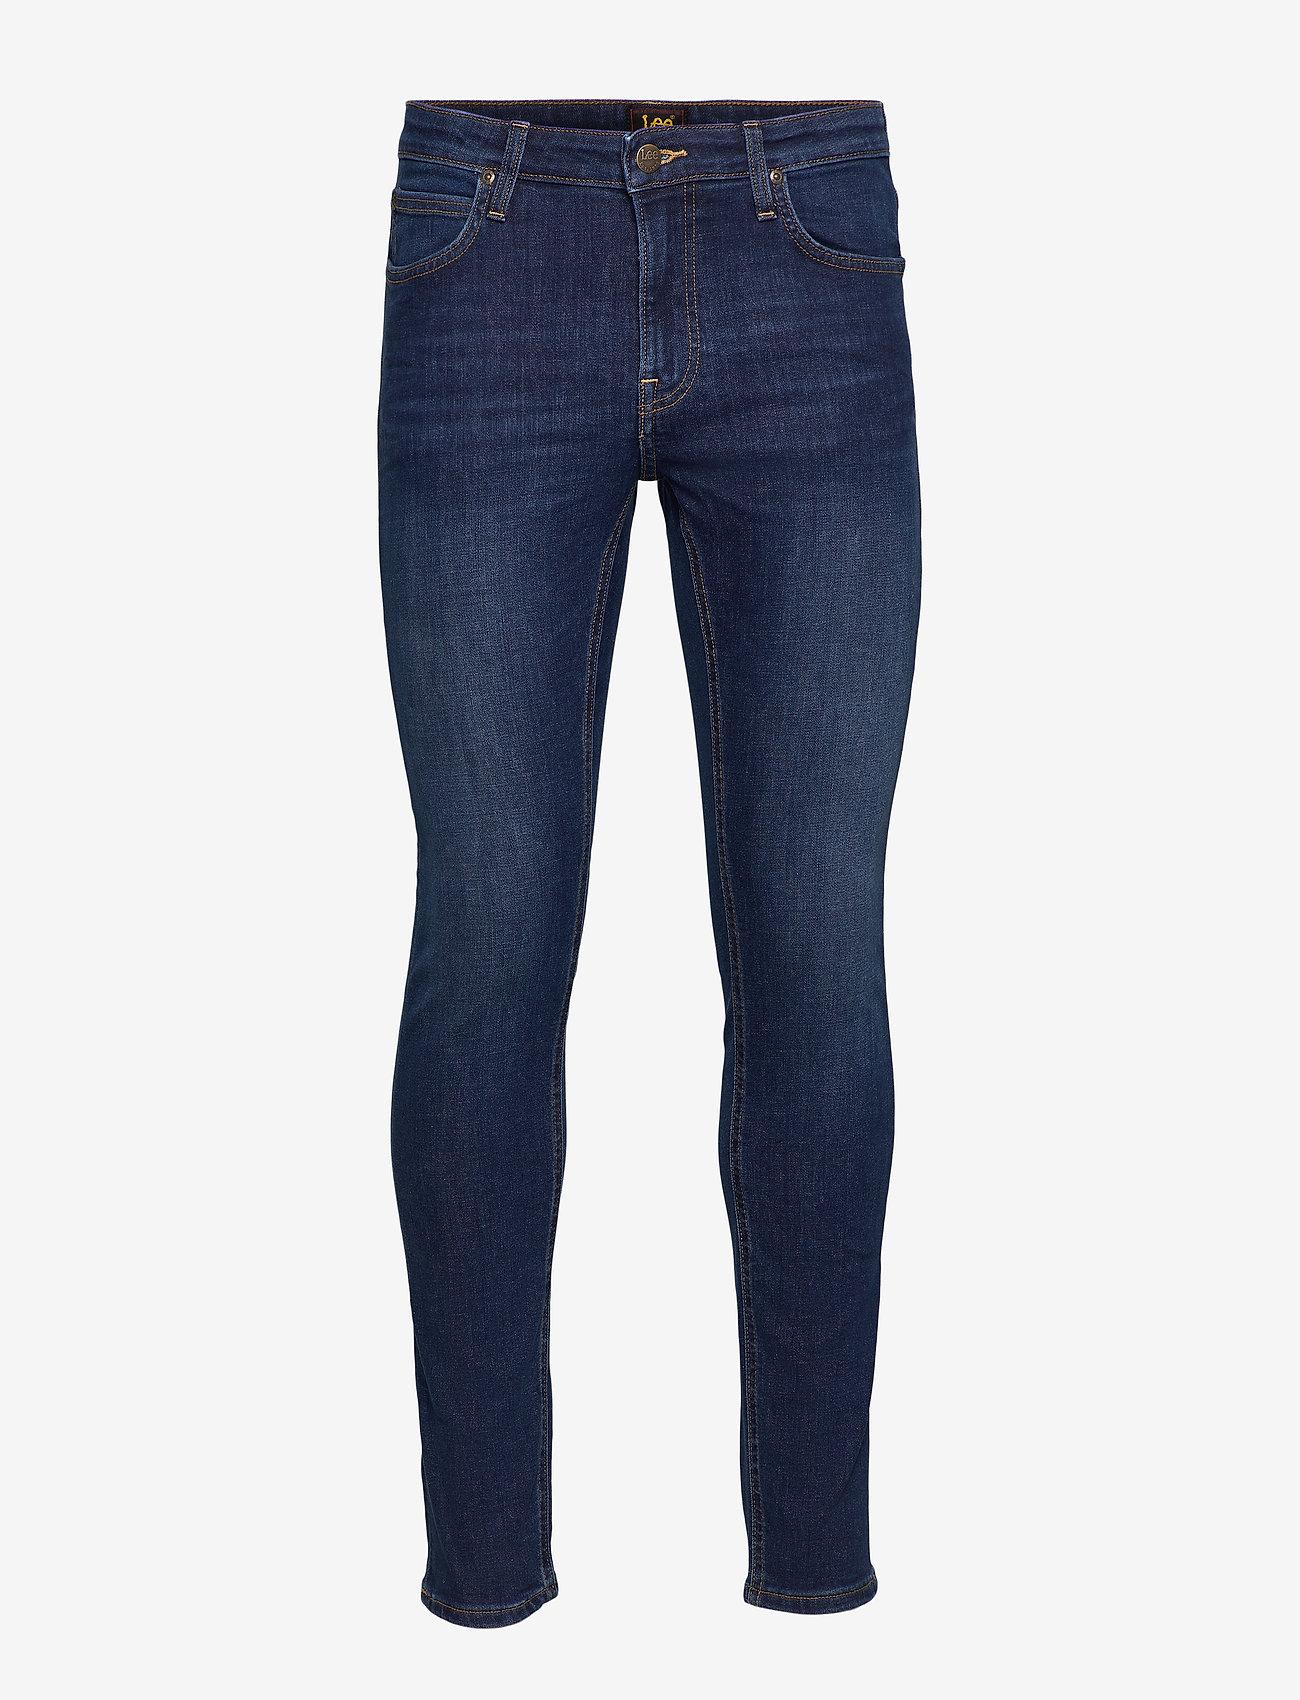 Lee Jeans - MALONE - skinny jeans - dark martha - 0